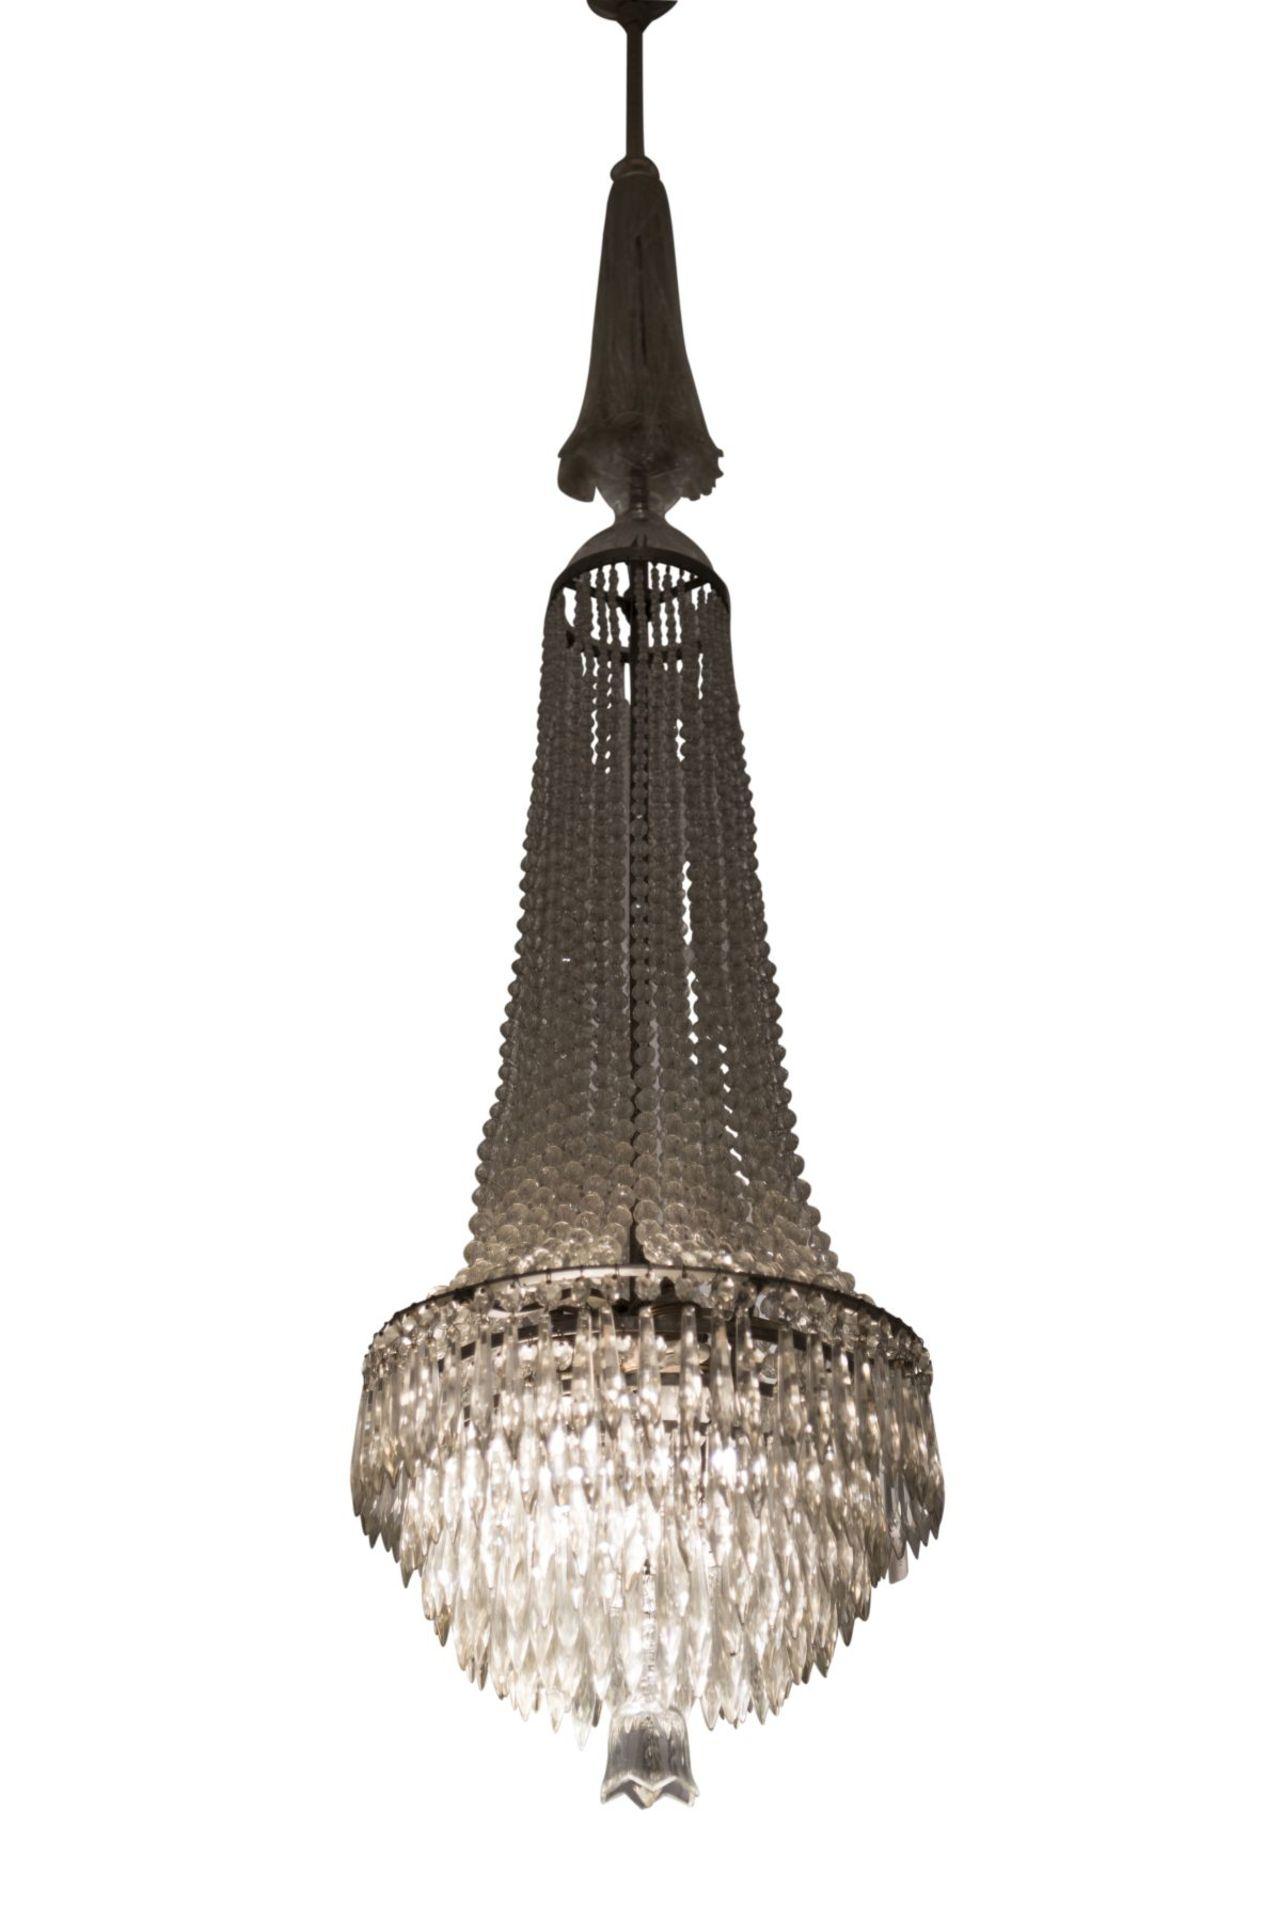 Decorative chandelier - Image 2 of 4